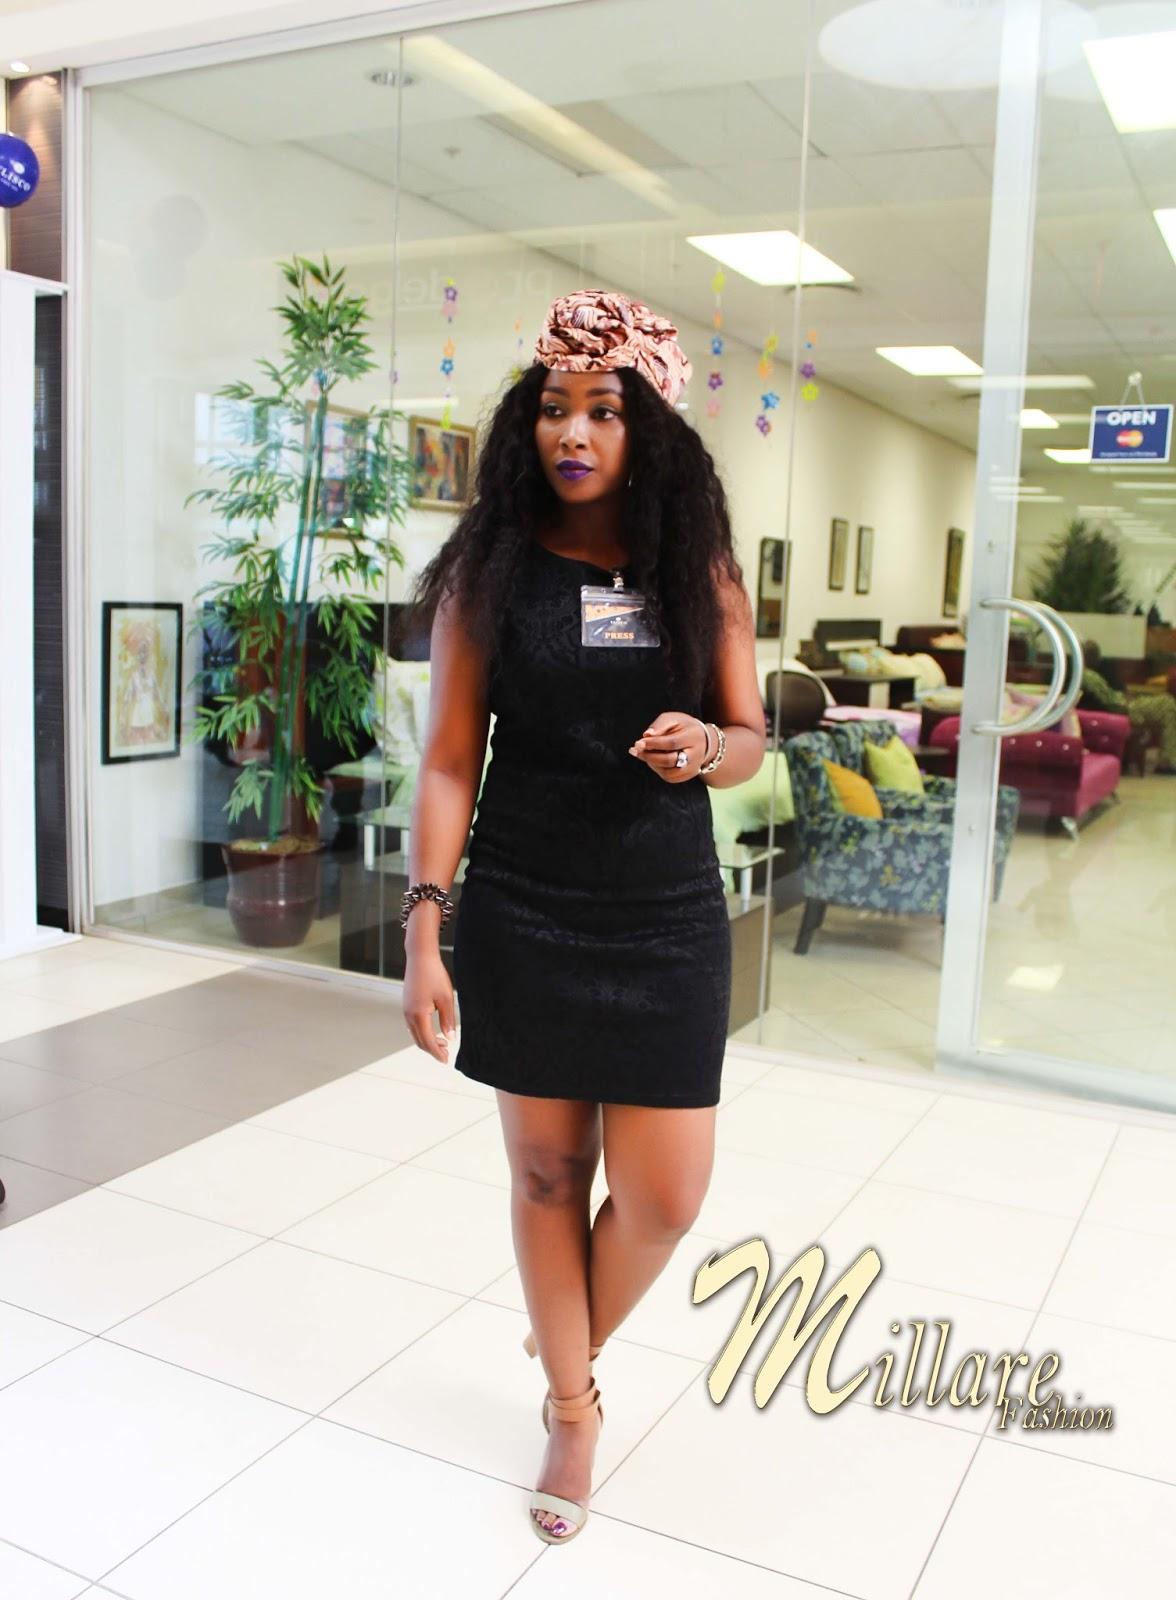 HeadWraps To The Rescue by Millicent Arebun